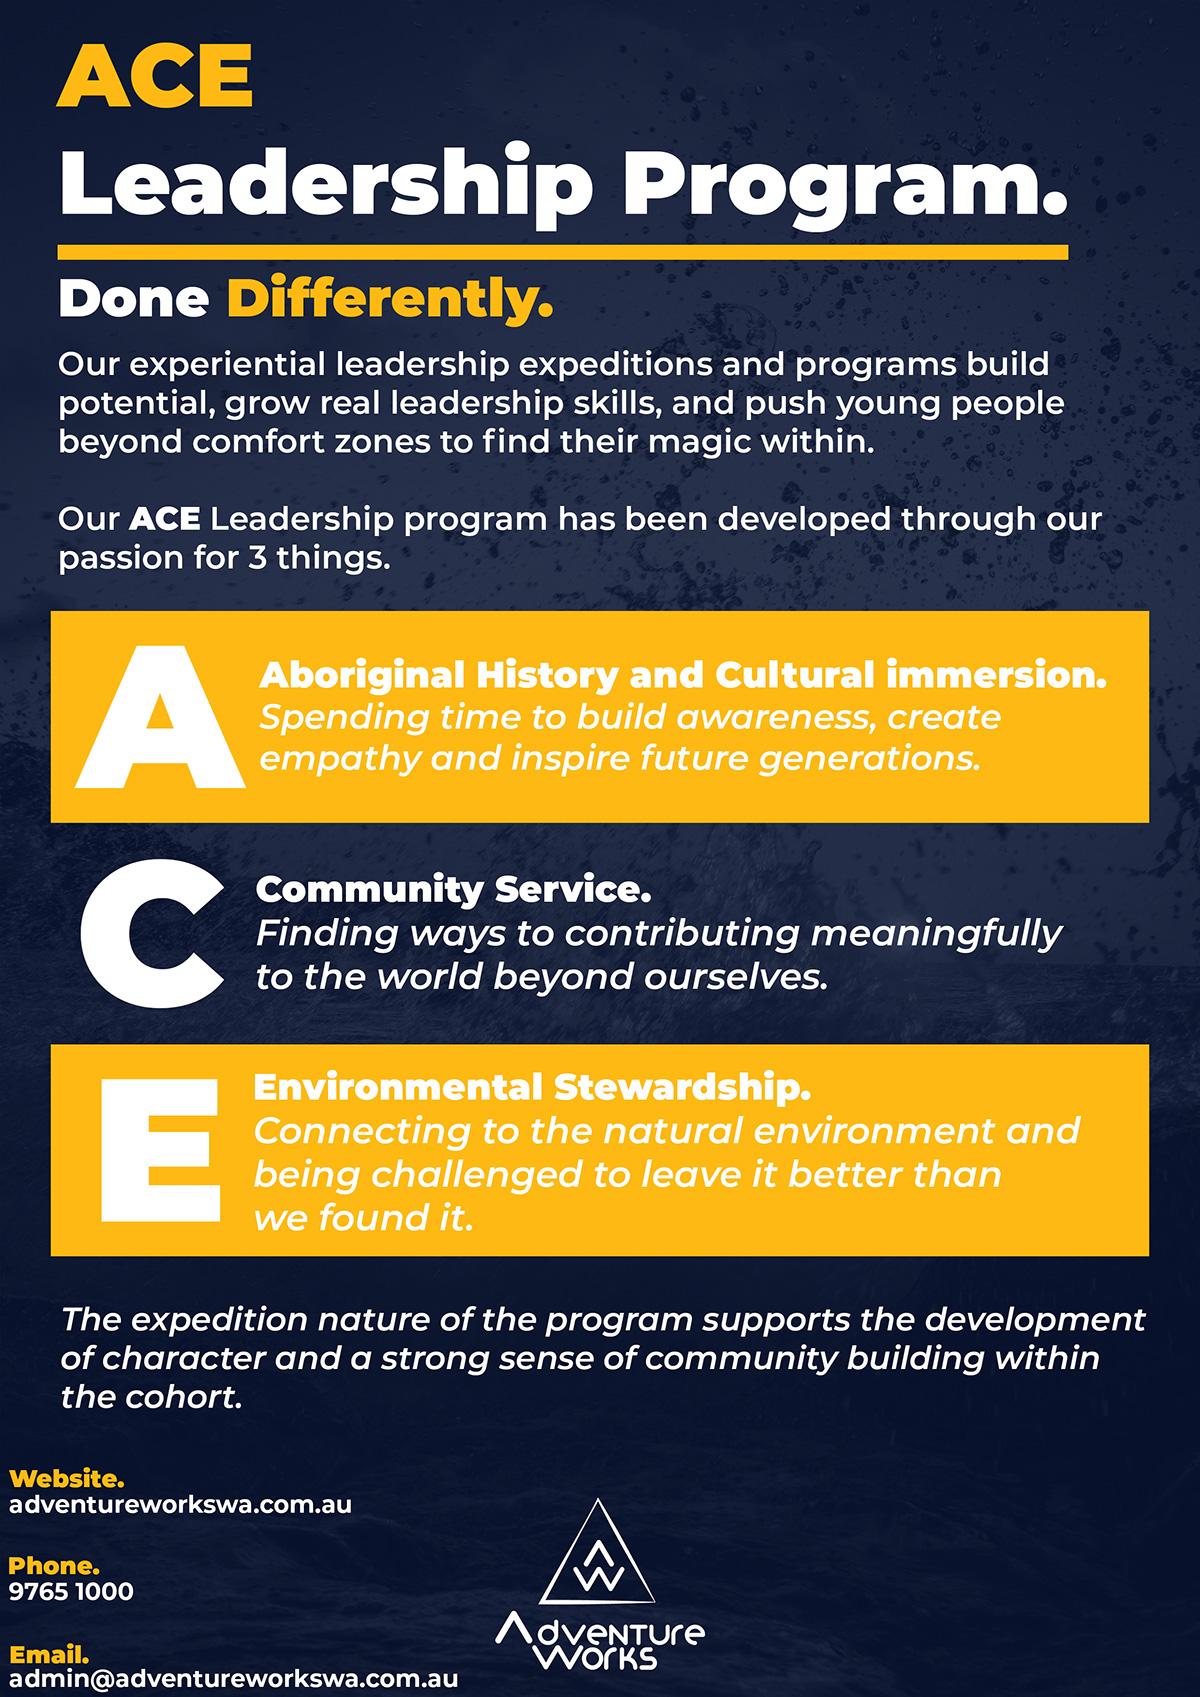 ACE Leadership Adventure Works WA, Kimberley, South West and Perth. #kimberley #leadership #adventure